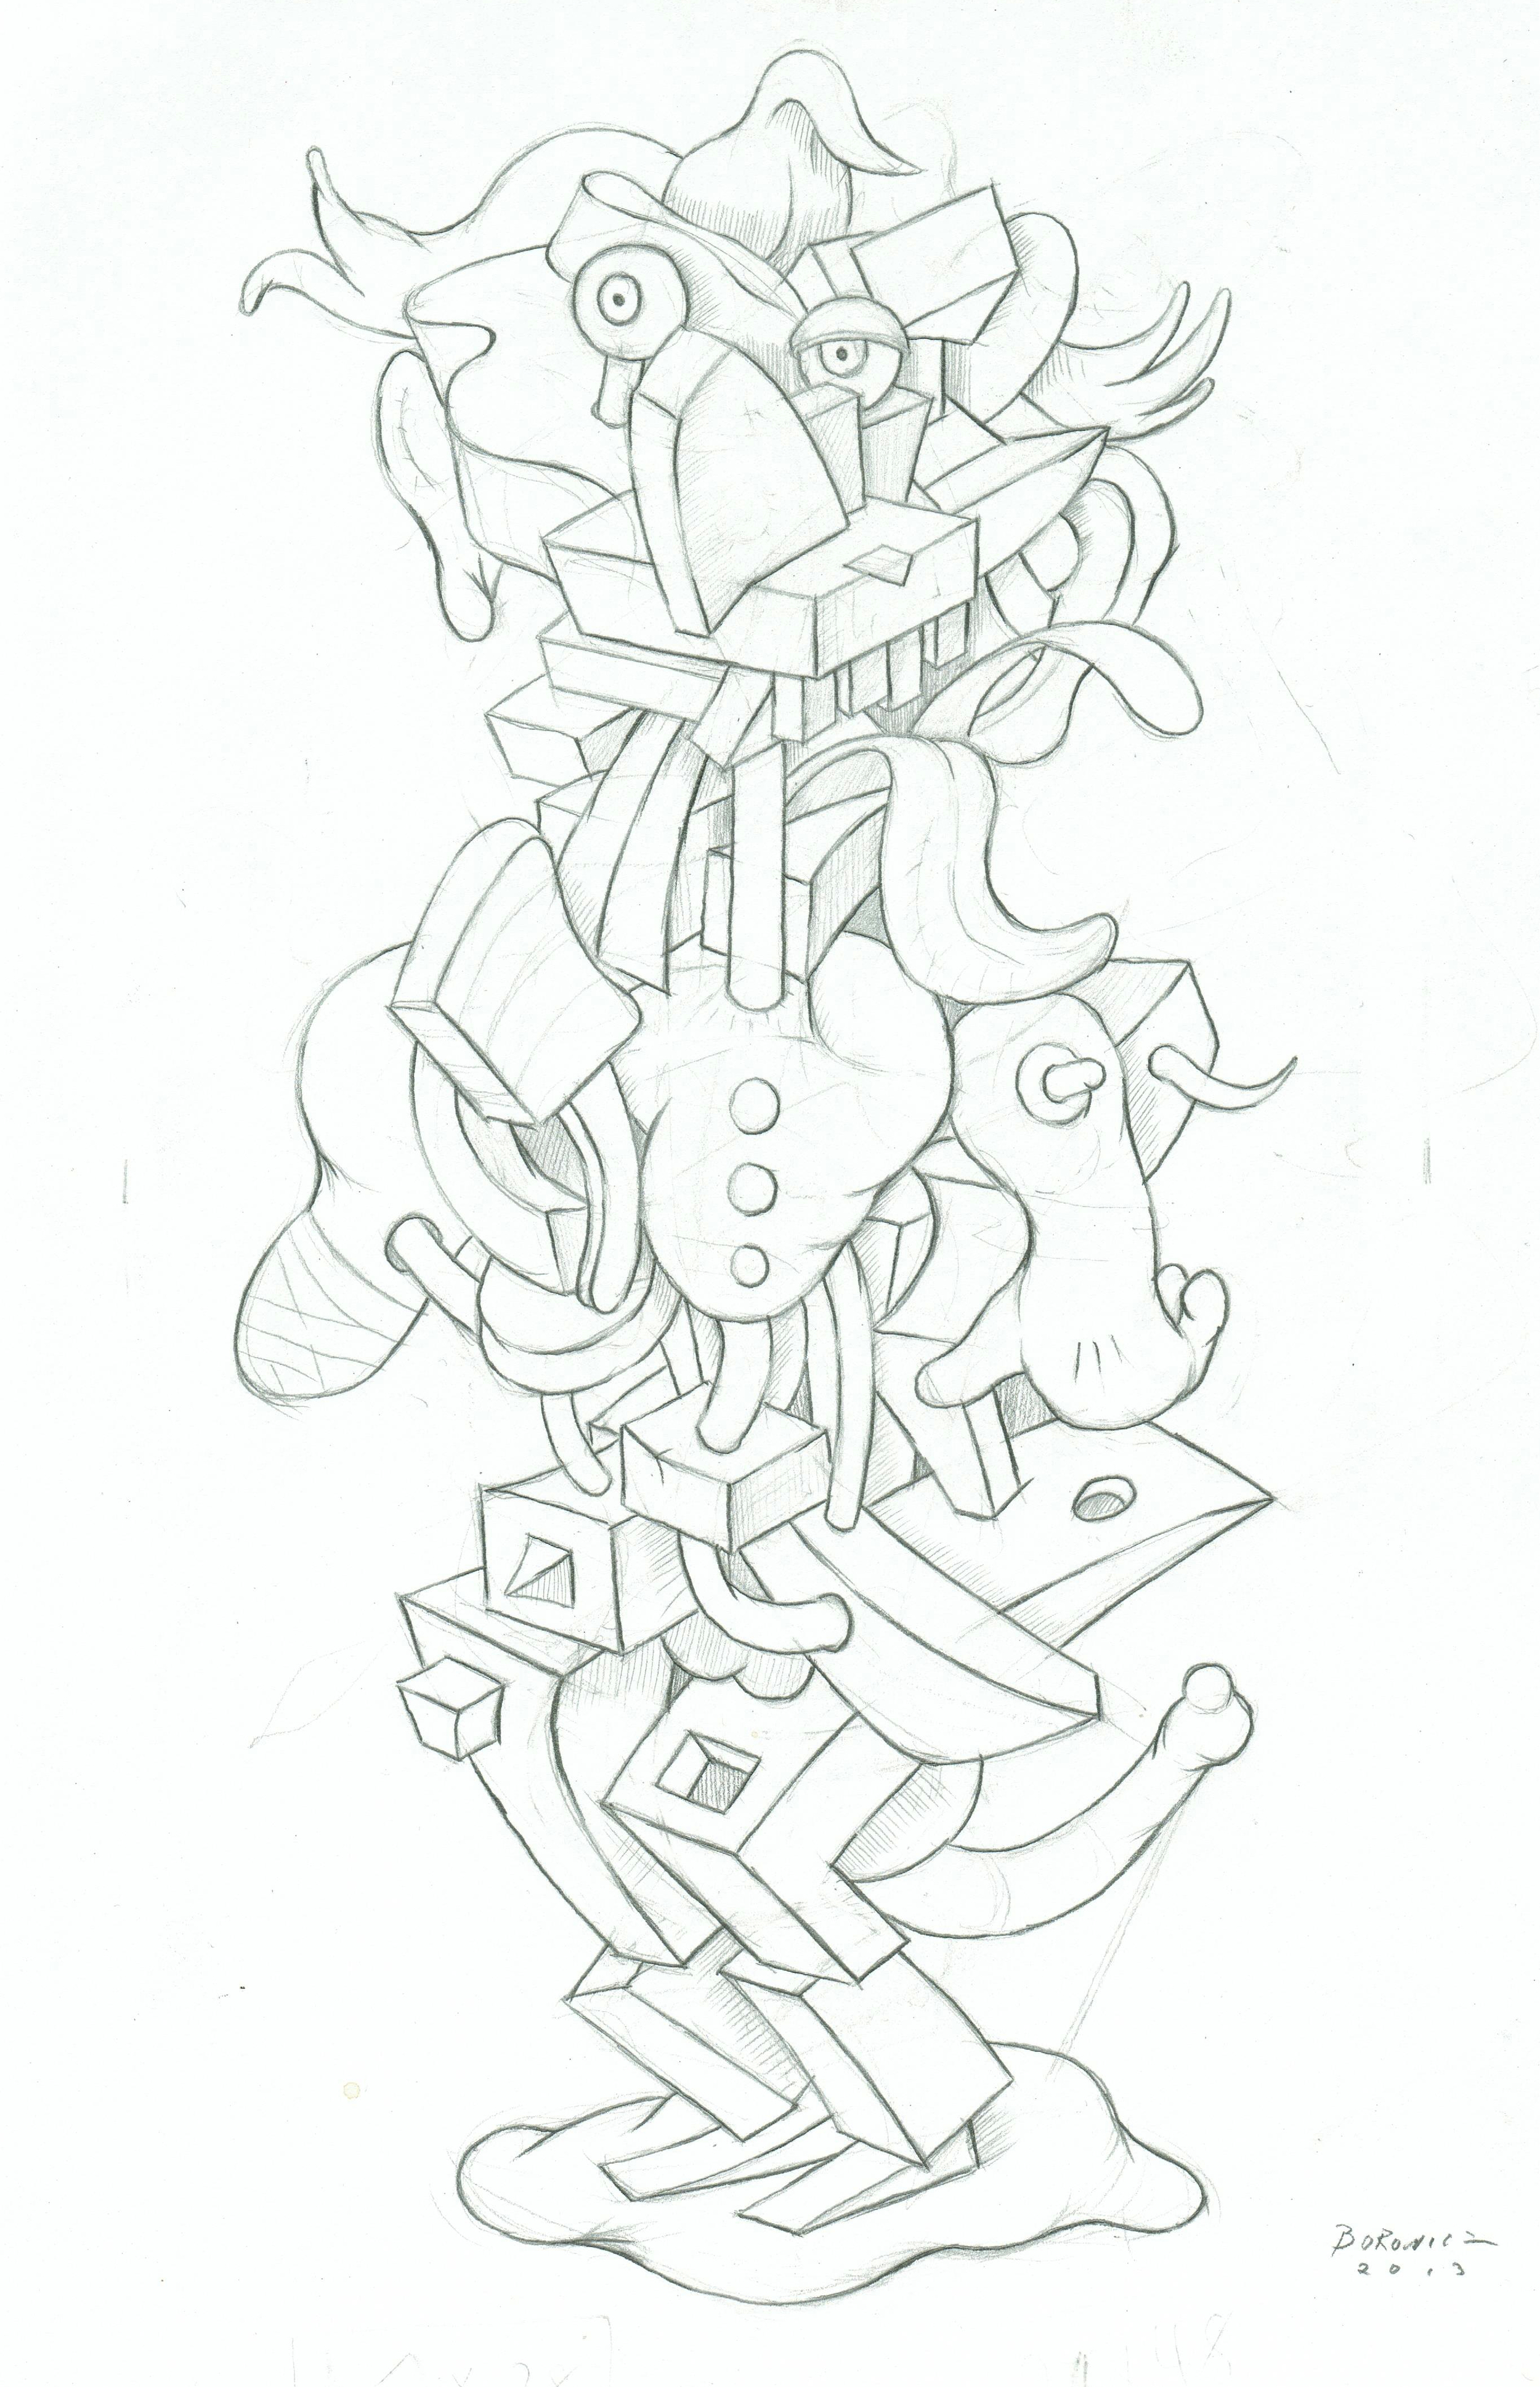 "Study for Automatic Slim   John Borowicz   graphite on paper, 11""x 7.5"" 2013"